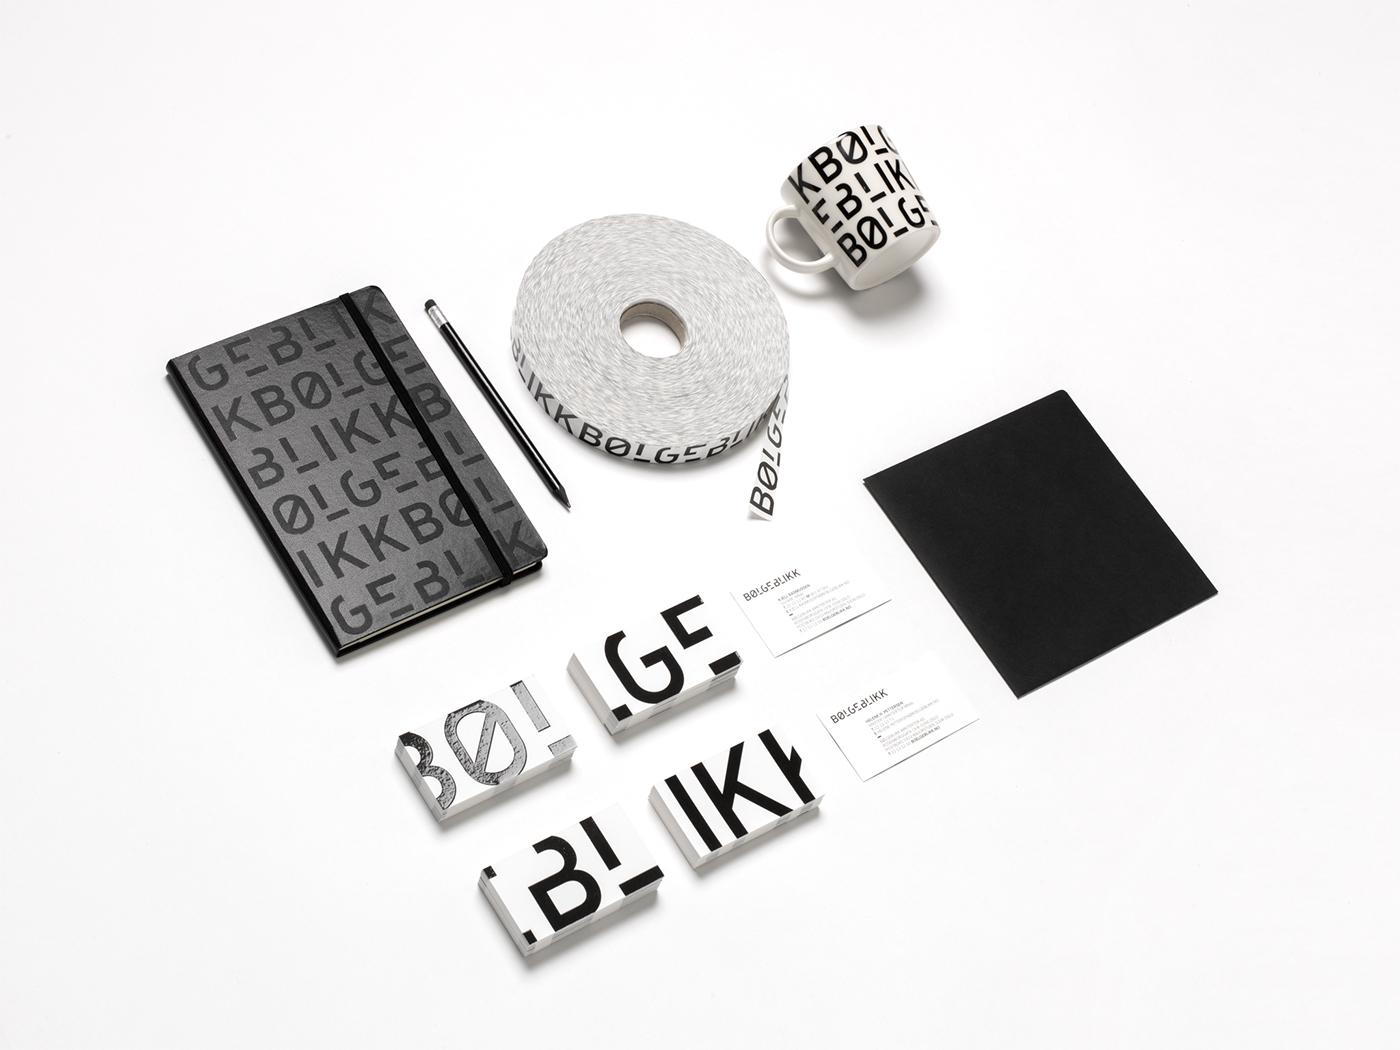 bolgeblikk-visual-identity-tank-design-03